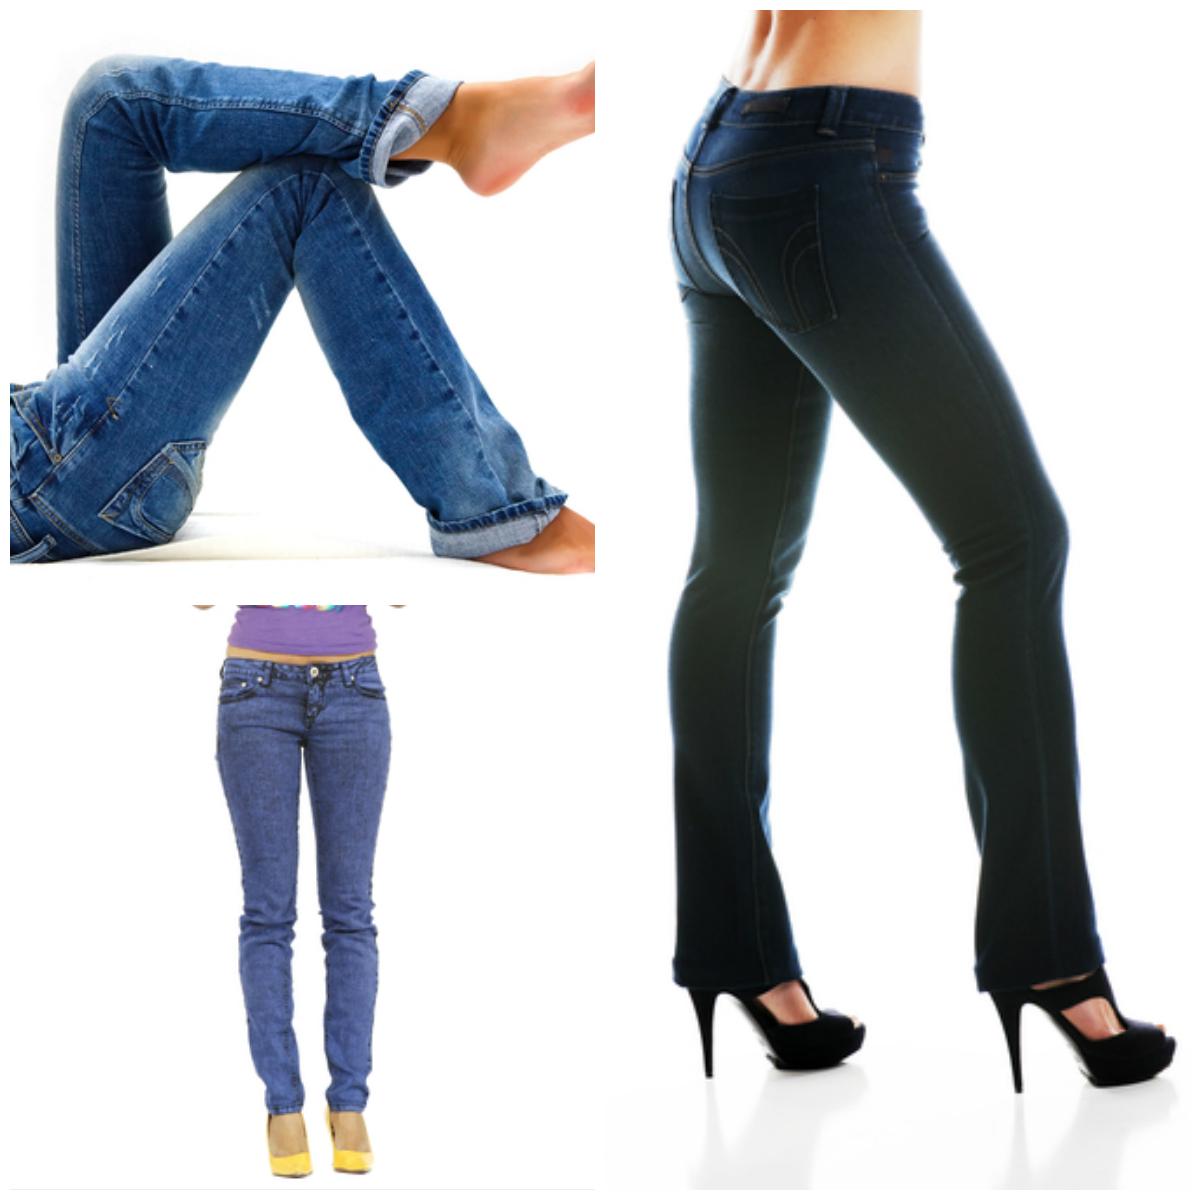 0fd5e4424ce8 Jeansgrößen in Inch berechnen